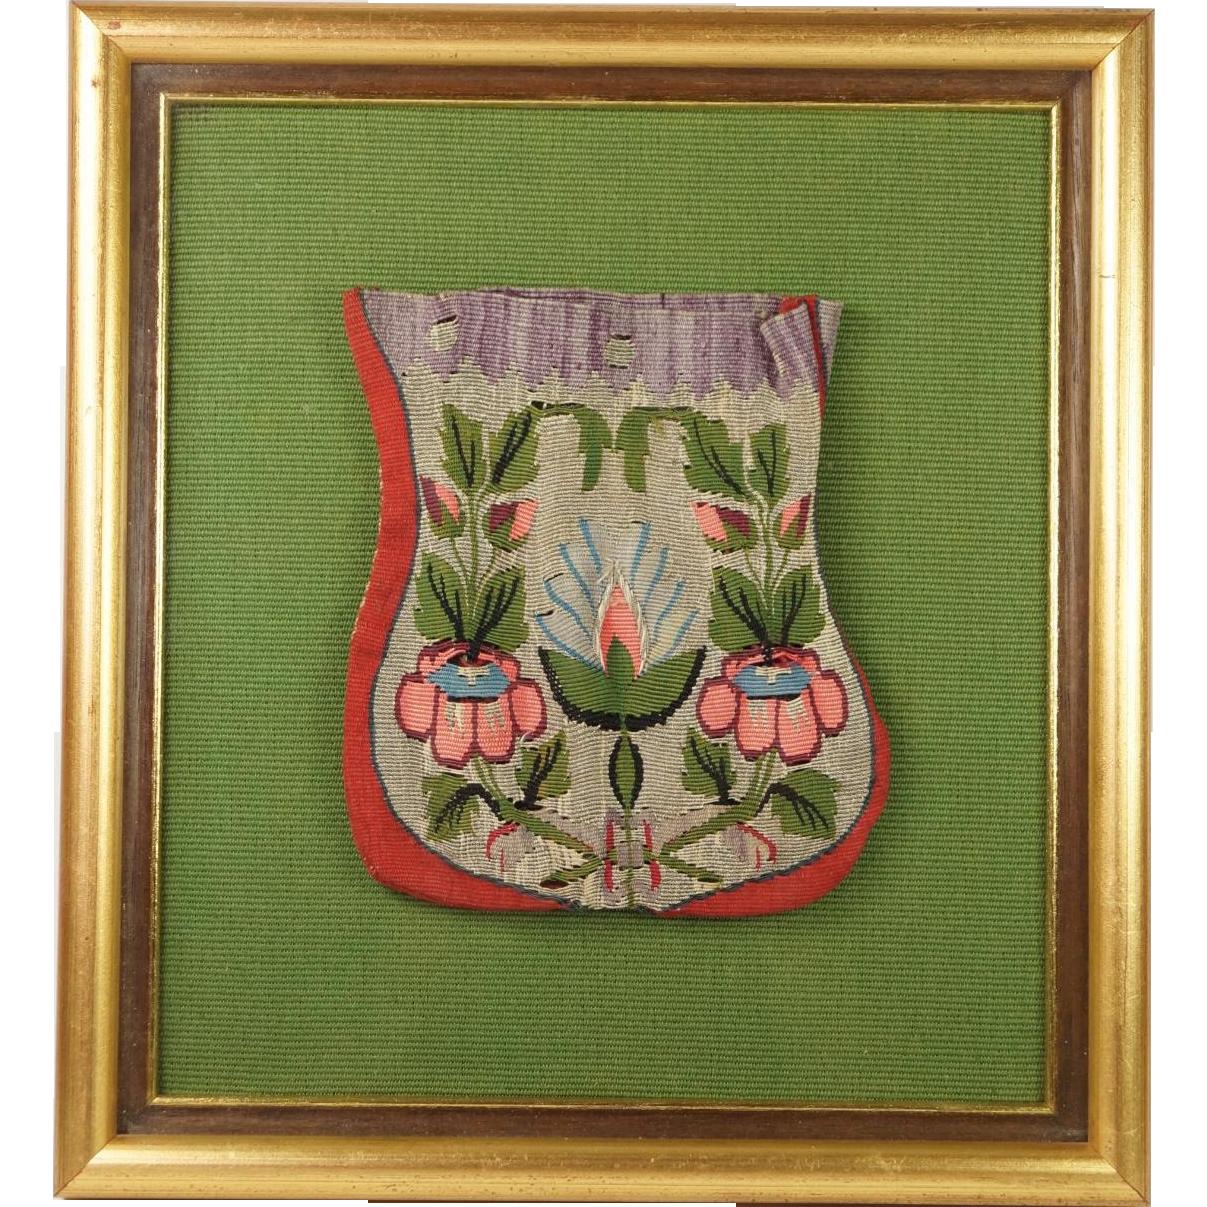 Antique 18th Century Reticule Purse Silk Tapestry Weave Framed Circa 1795